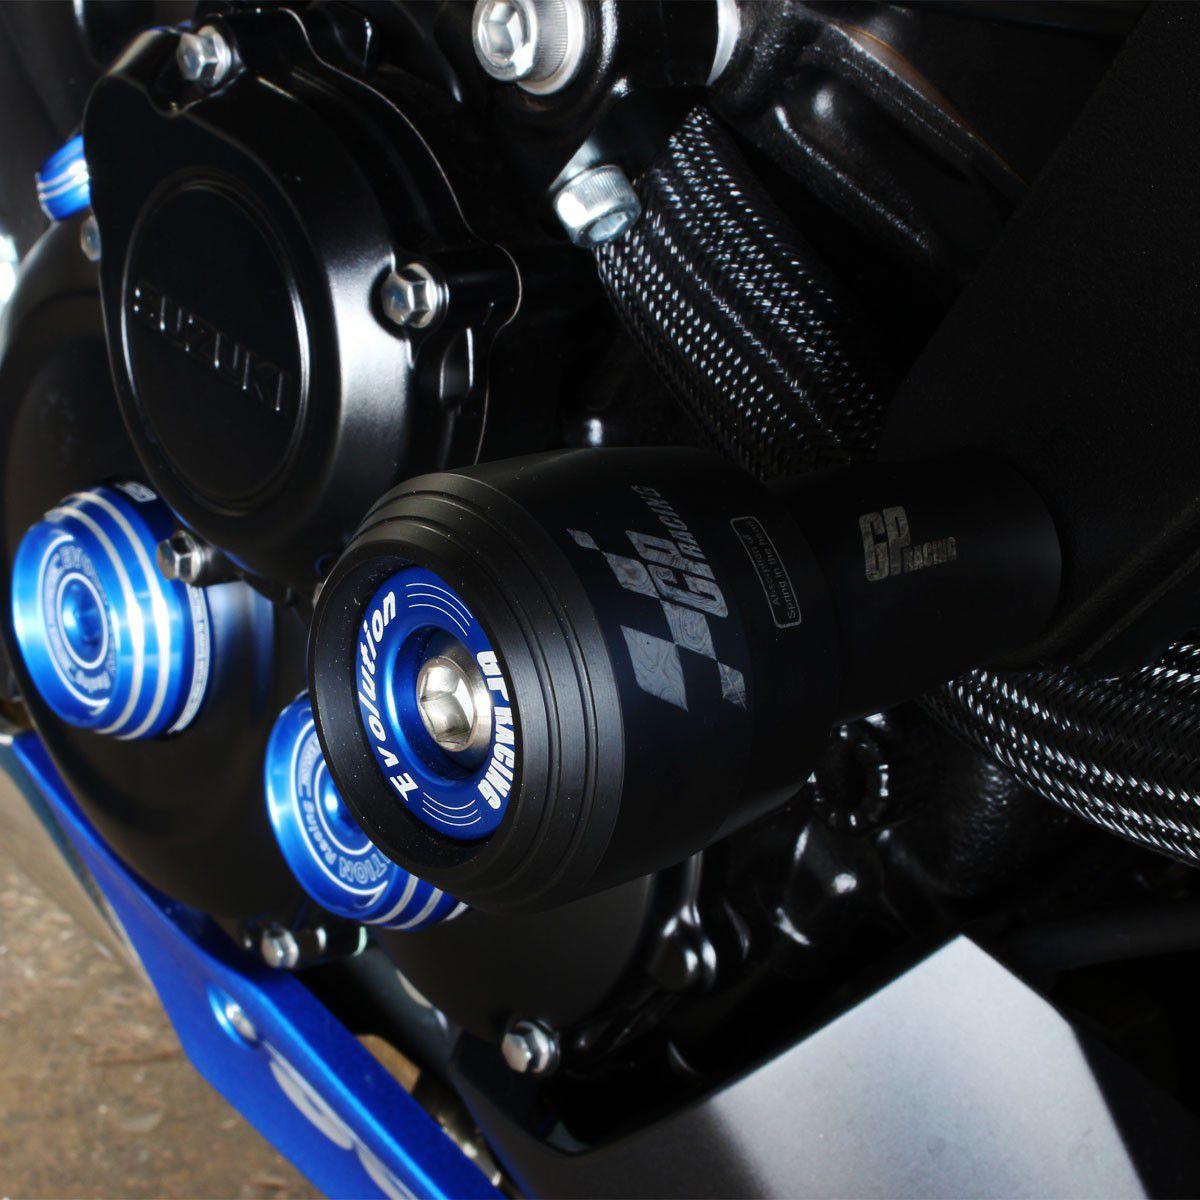 Slider Evolution GP Nylon Kawasaki Z800 Z 800 13 14 15 16 17